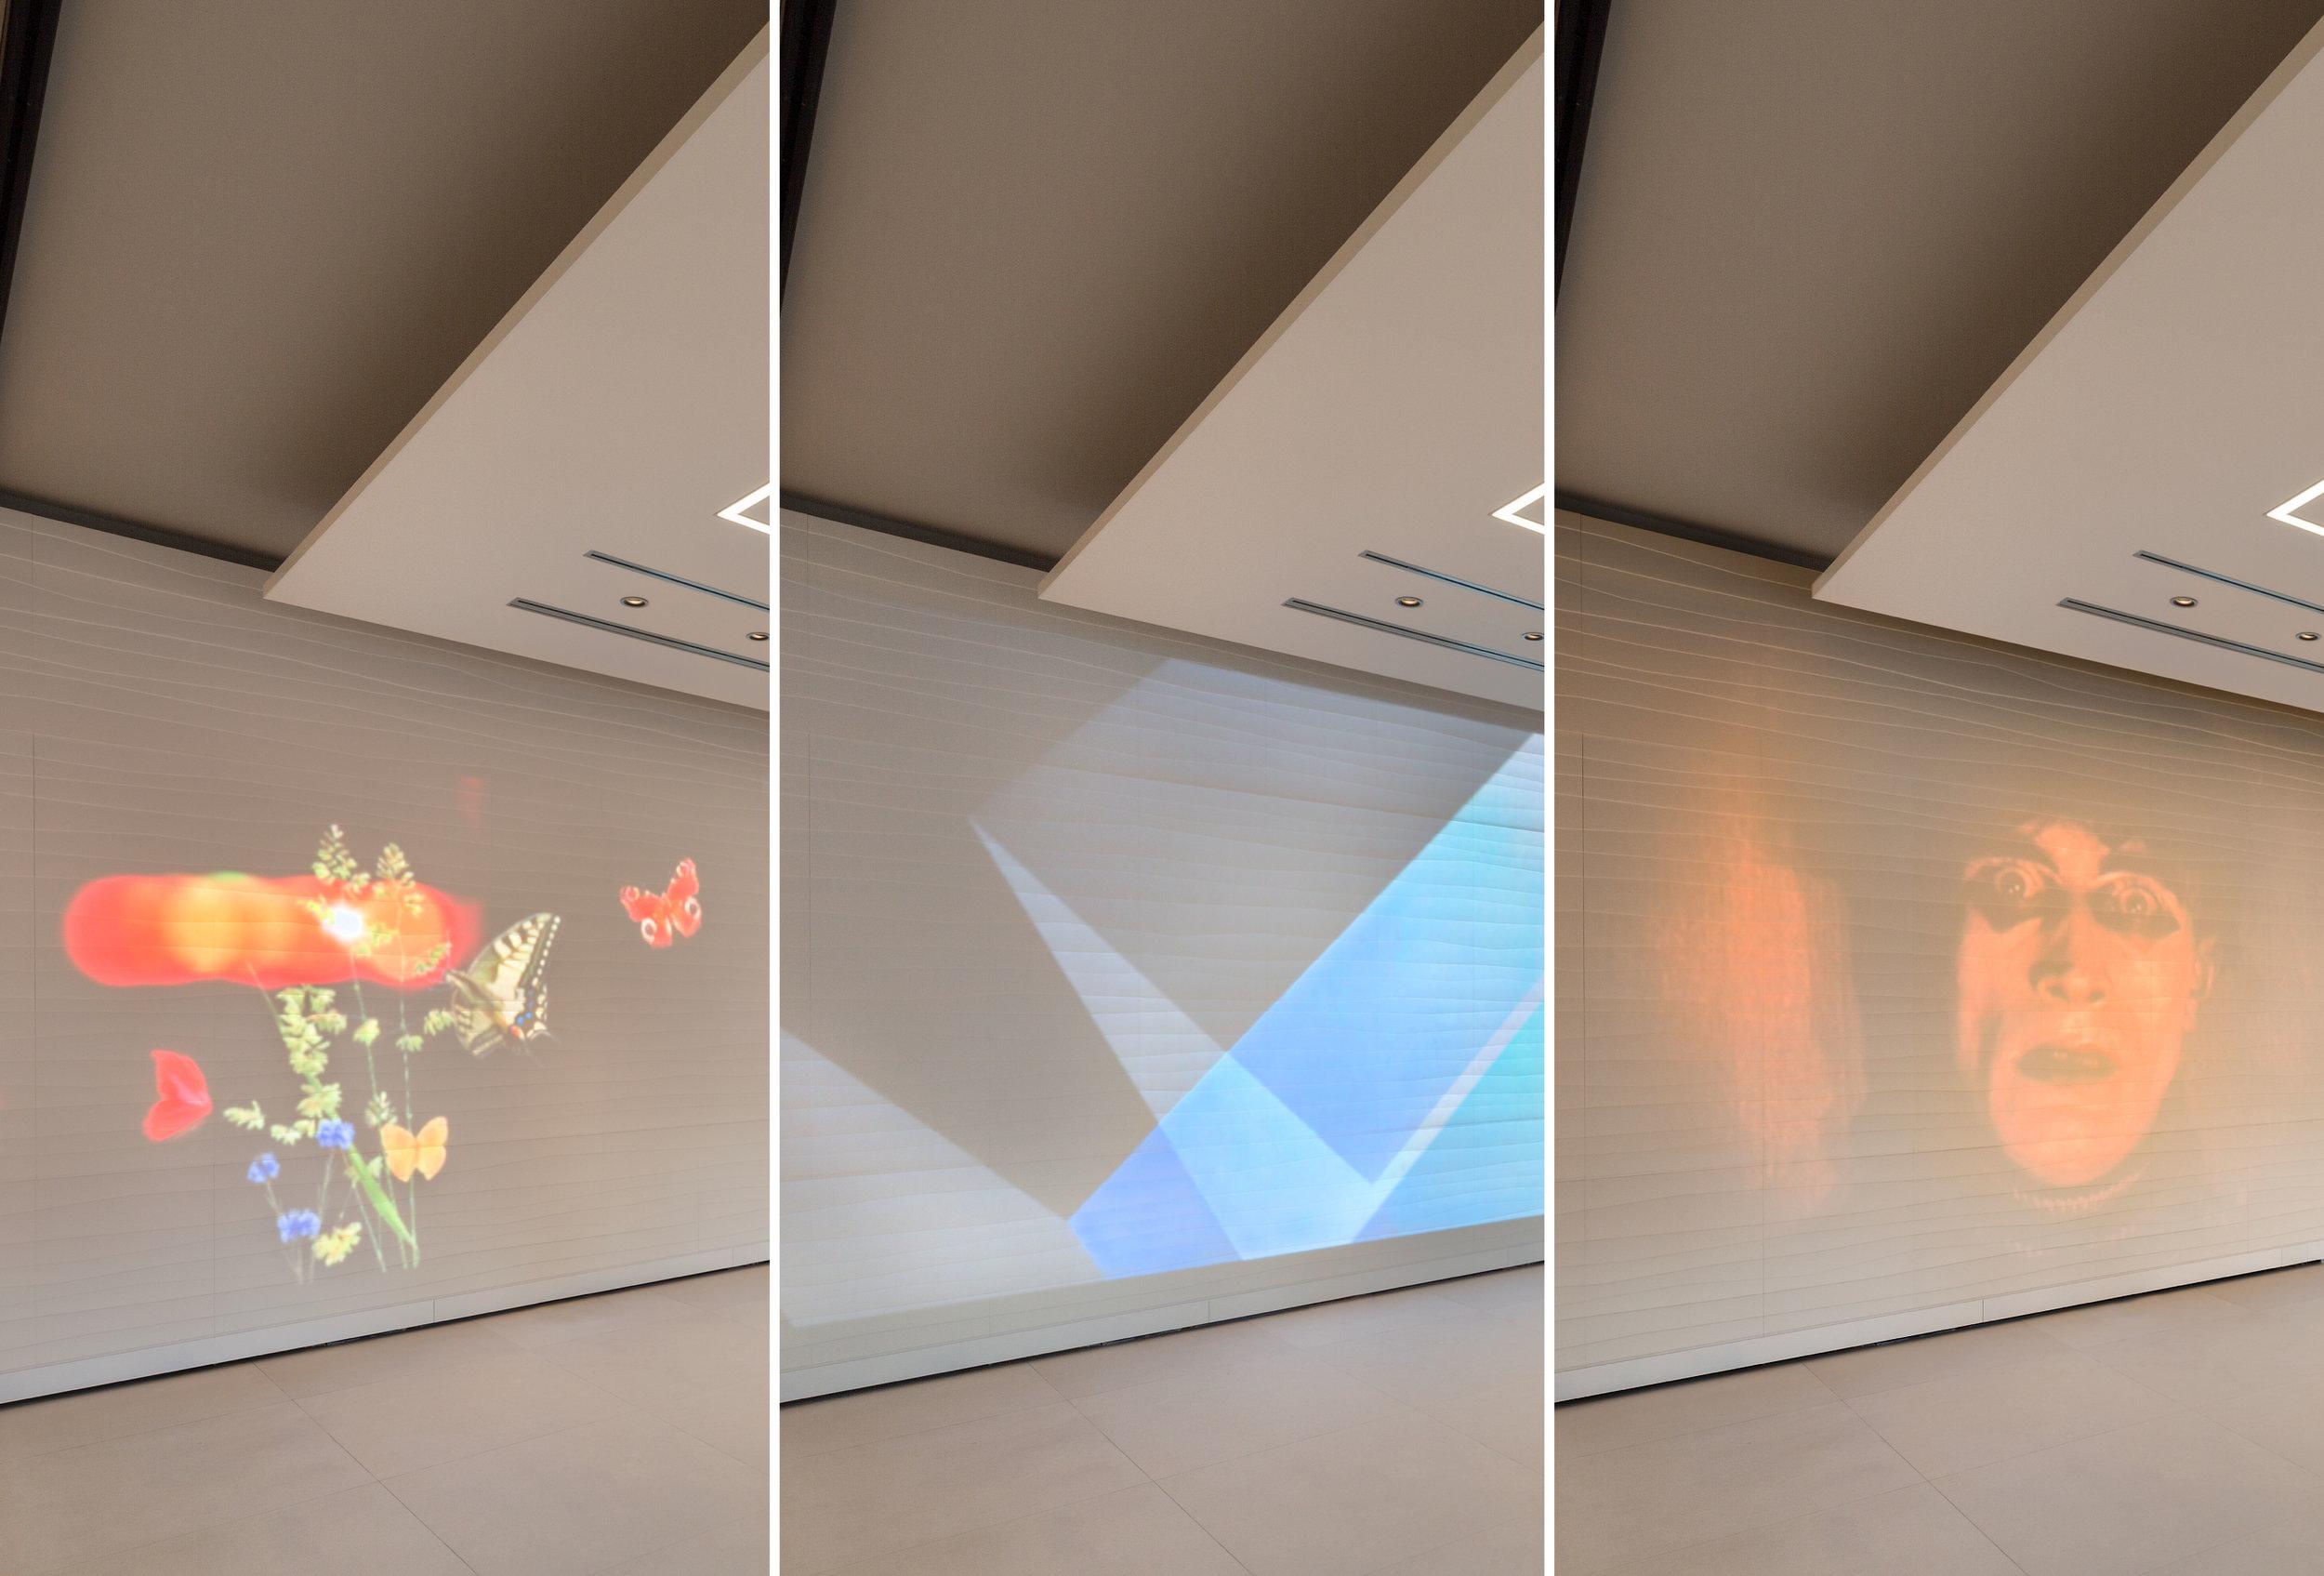 bertelsmann-berlin_coorporate-interior-design_coordination-berlin_03.jpg